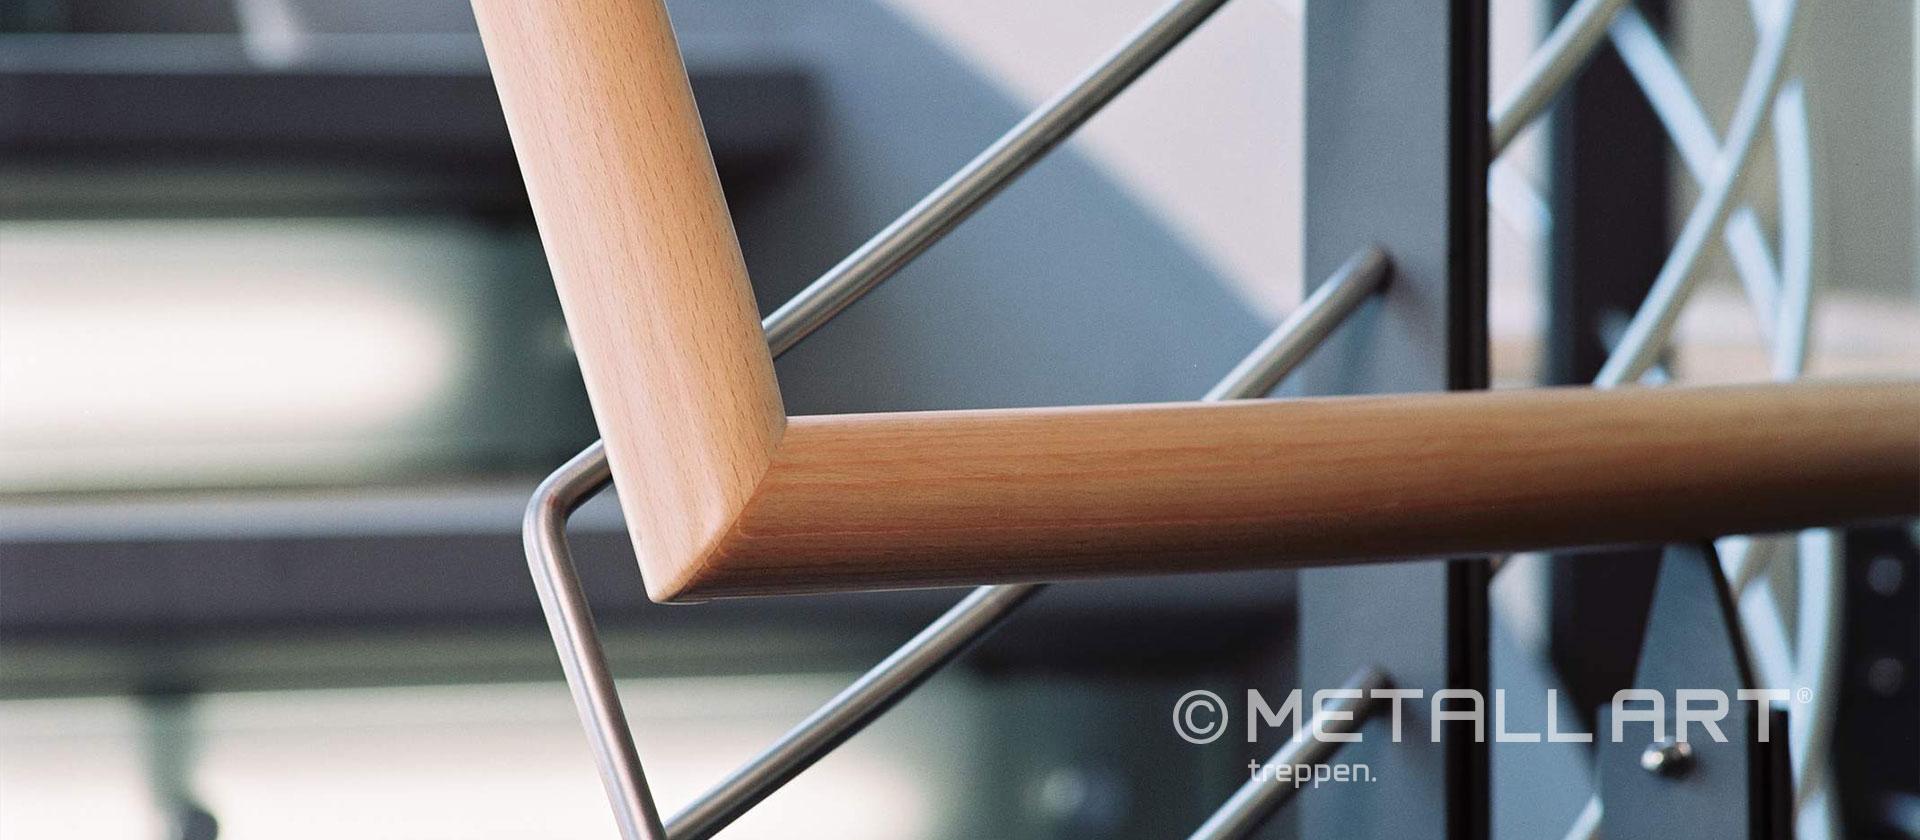 Eleganter Holzhandlauf mit Metall